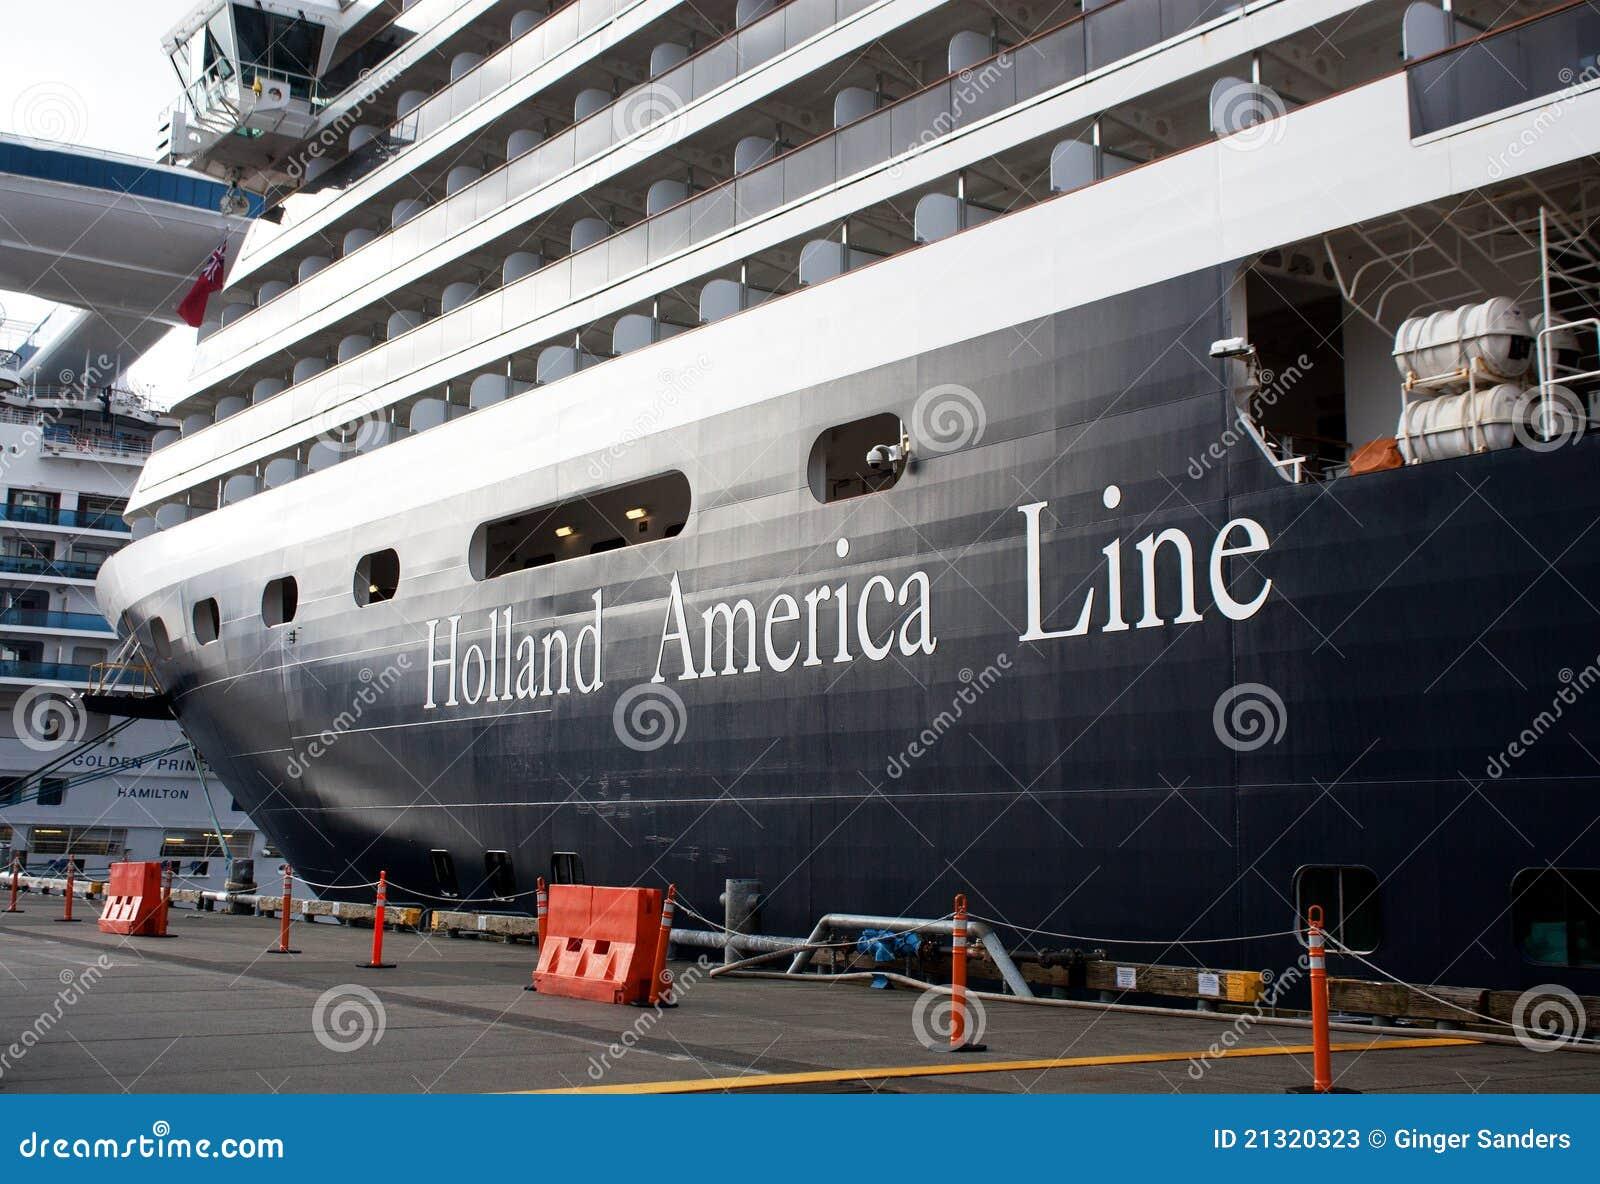 Holland America Ship in Port